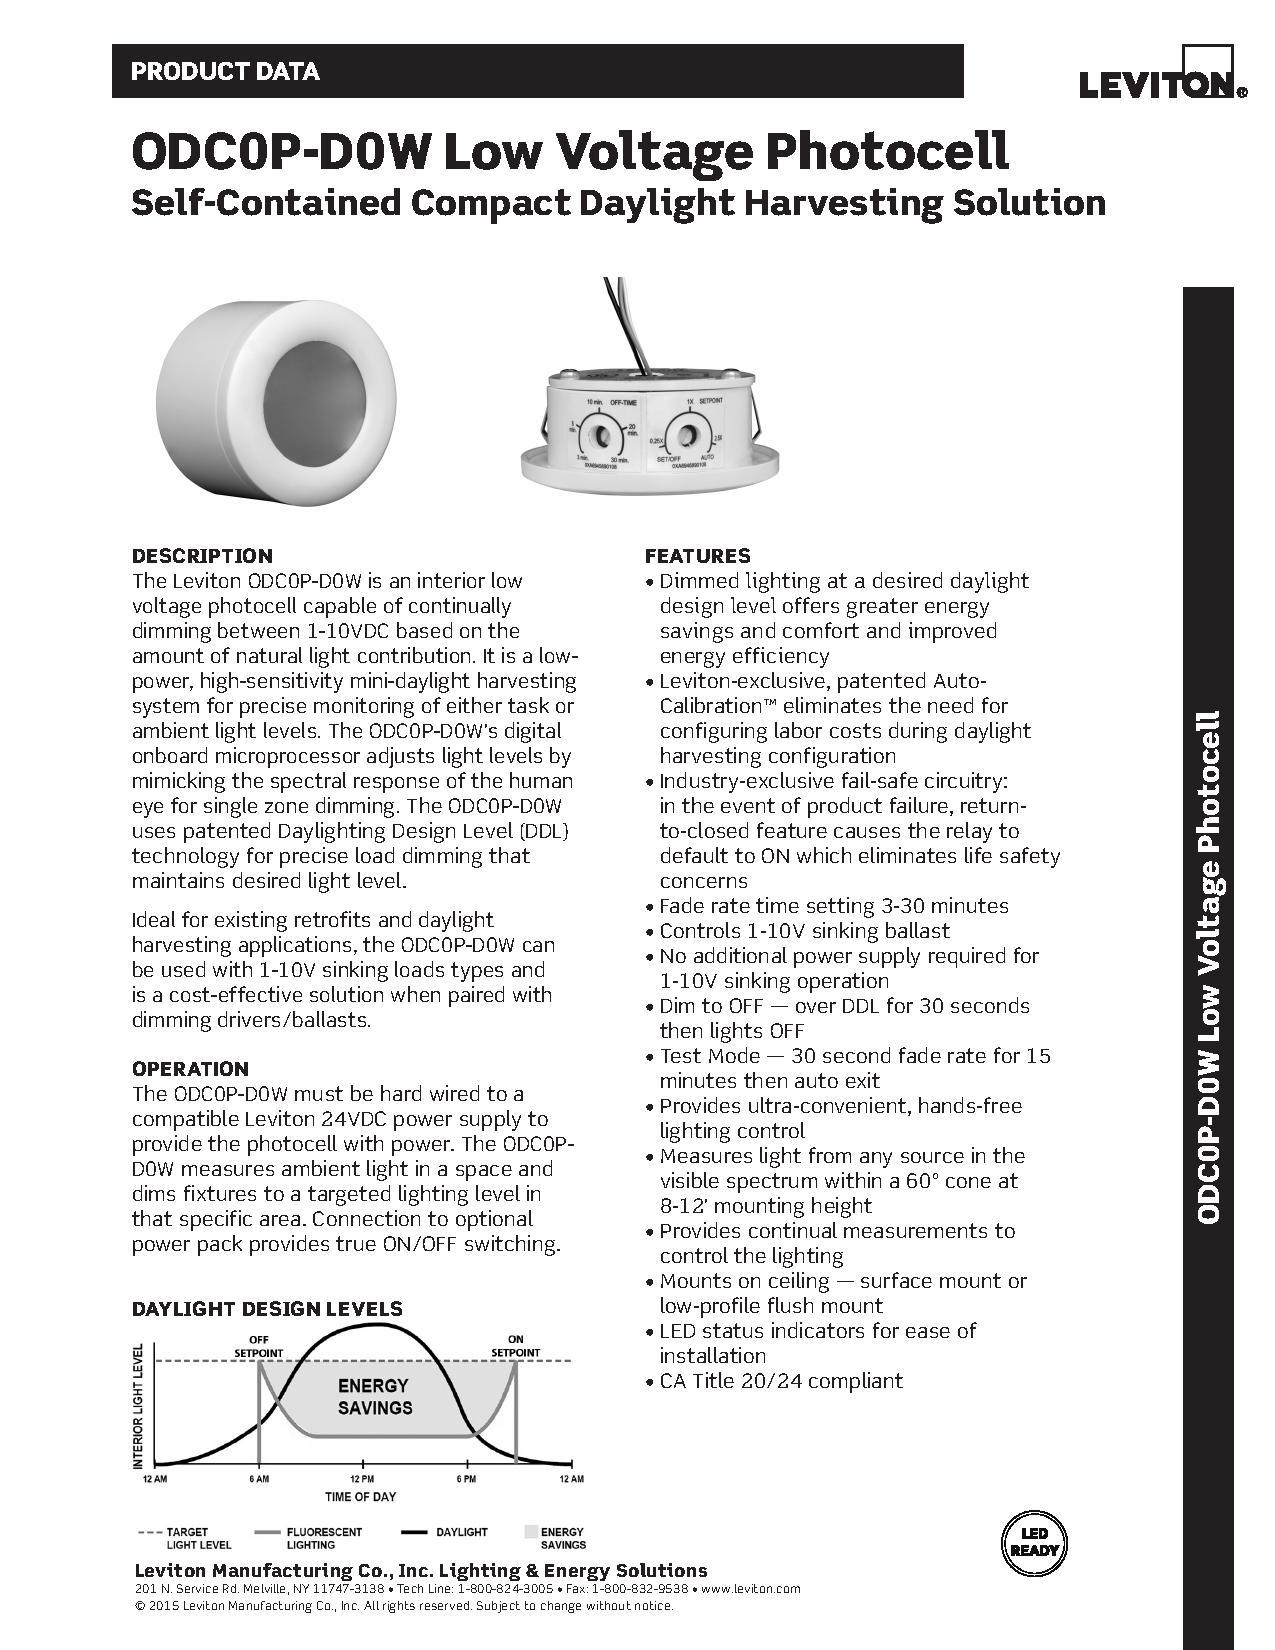 Leviton ODC0P-D0W Low Voltage 1-10V Dimming Daylight Sensor | AJB Sales